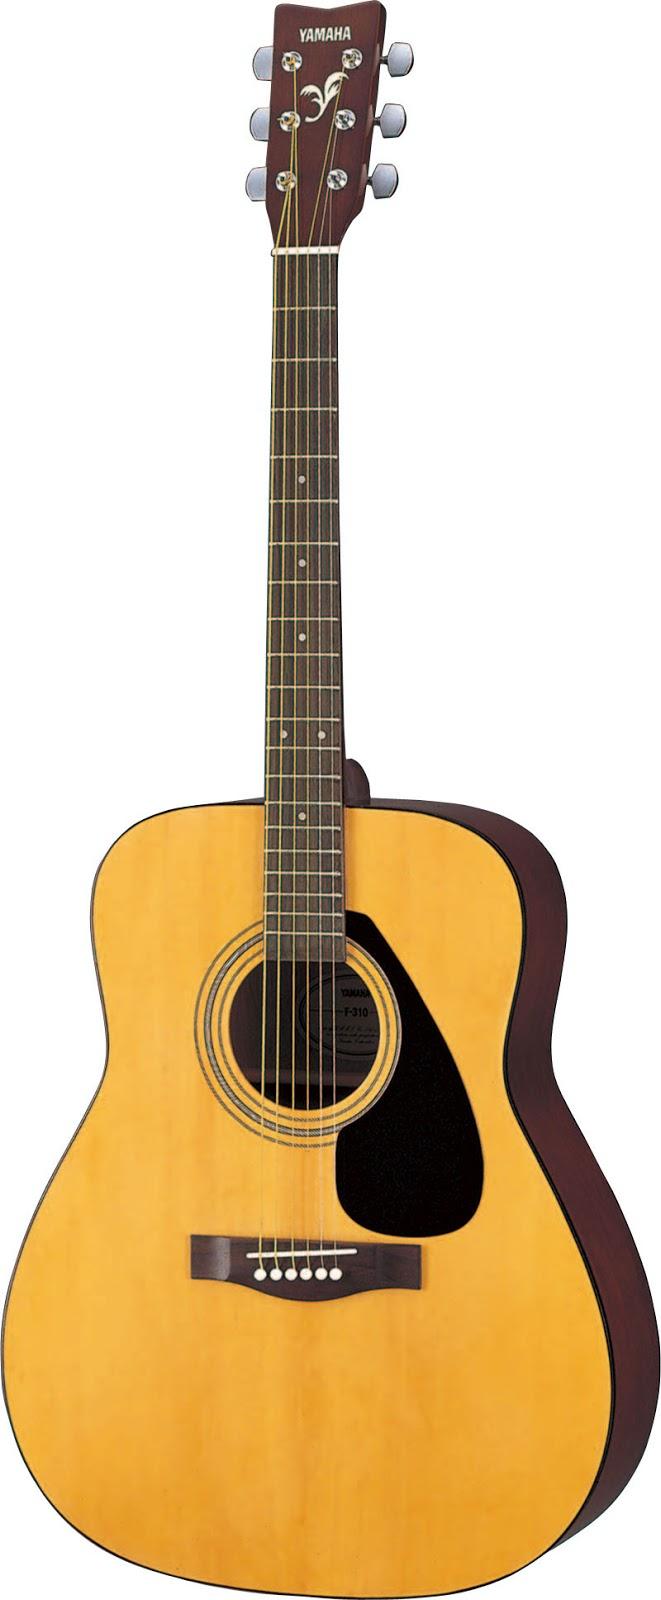 Spesifikasi Dan Harga Gitar Akustik Yamaha F310 Upload By Me